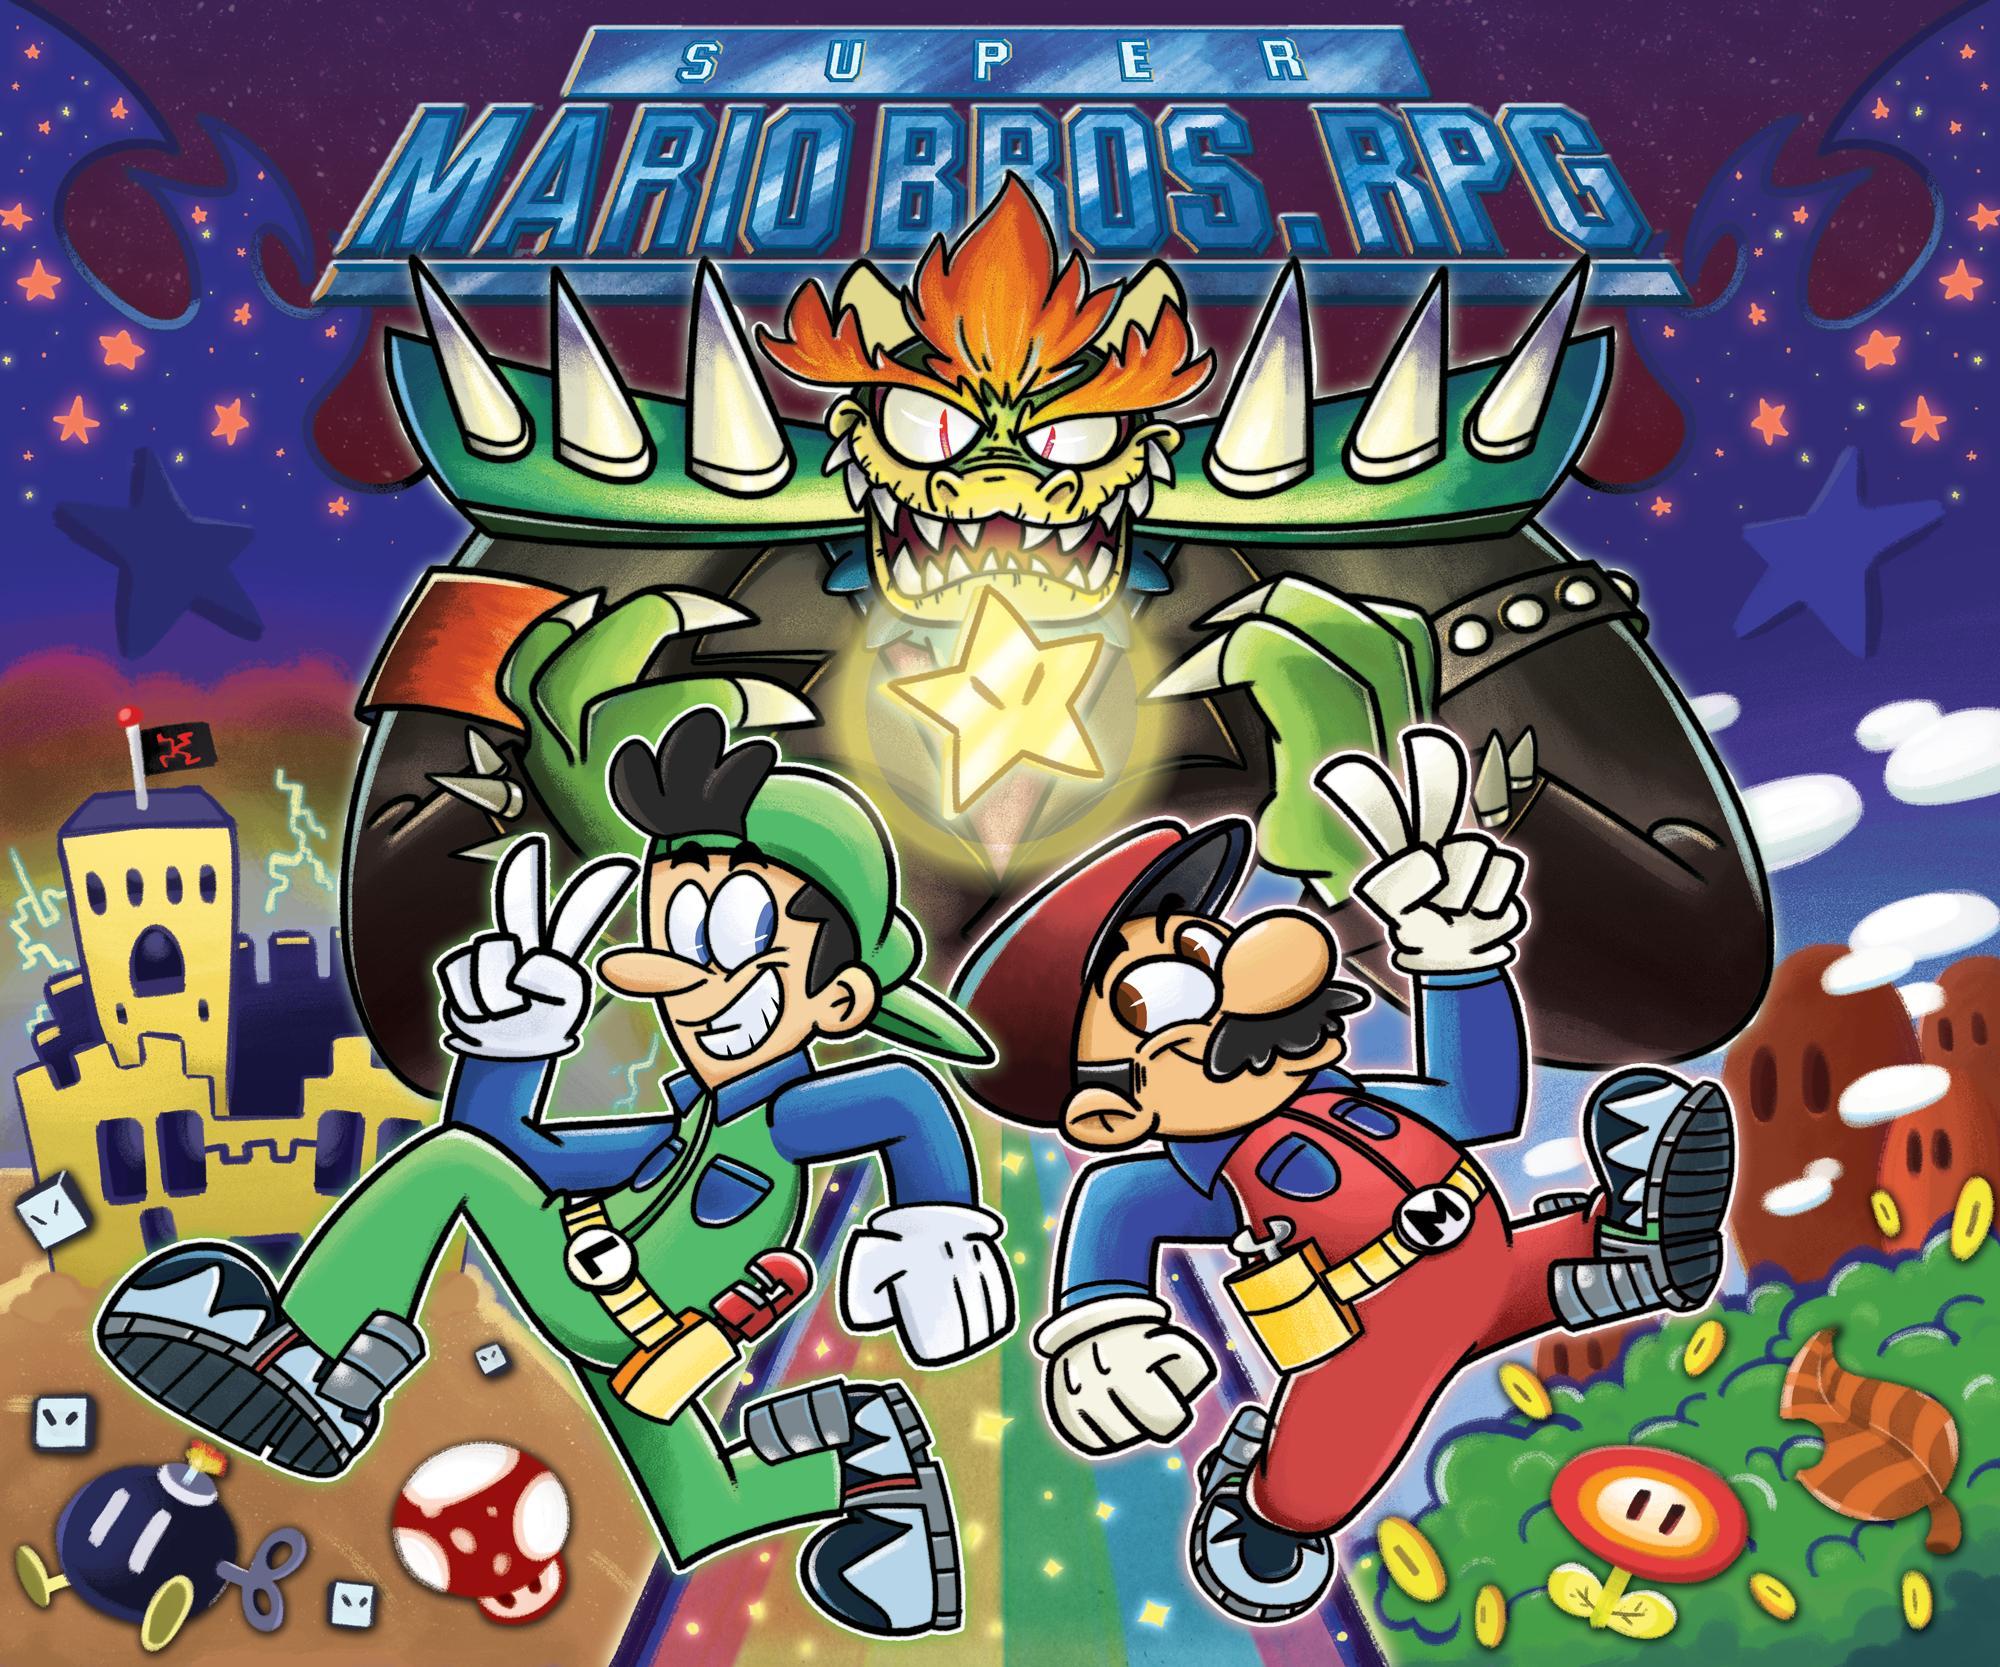 faa super mario bros the movie the game super mario know your meme